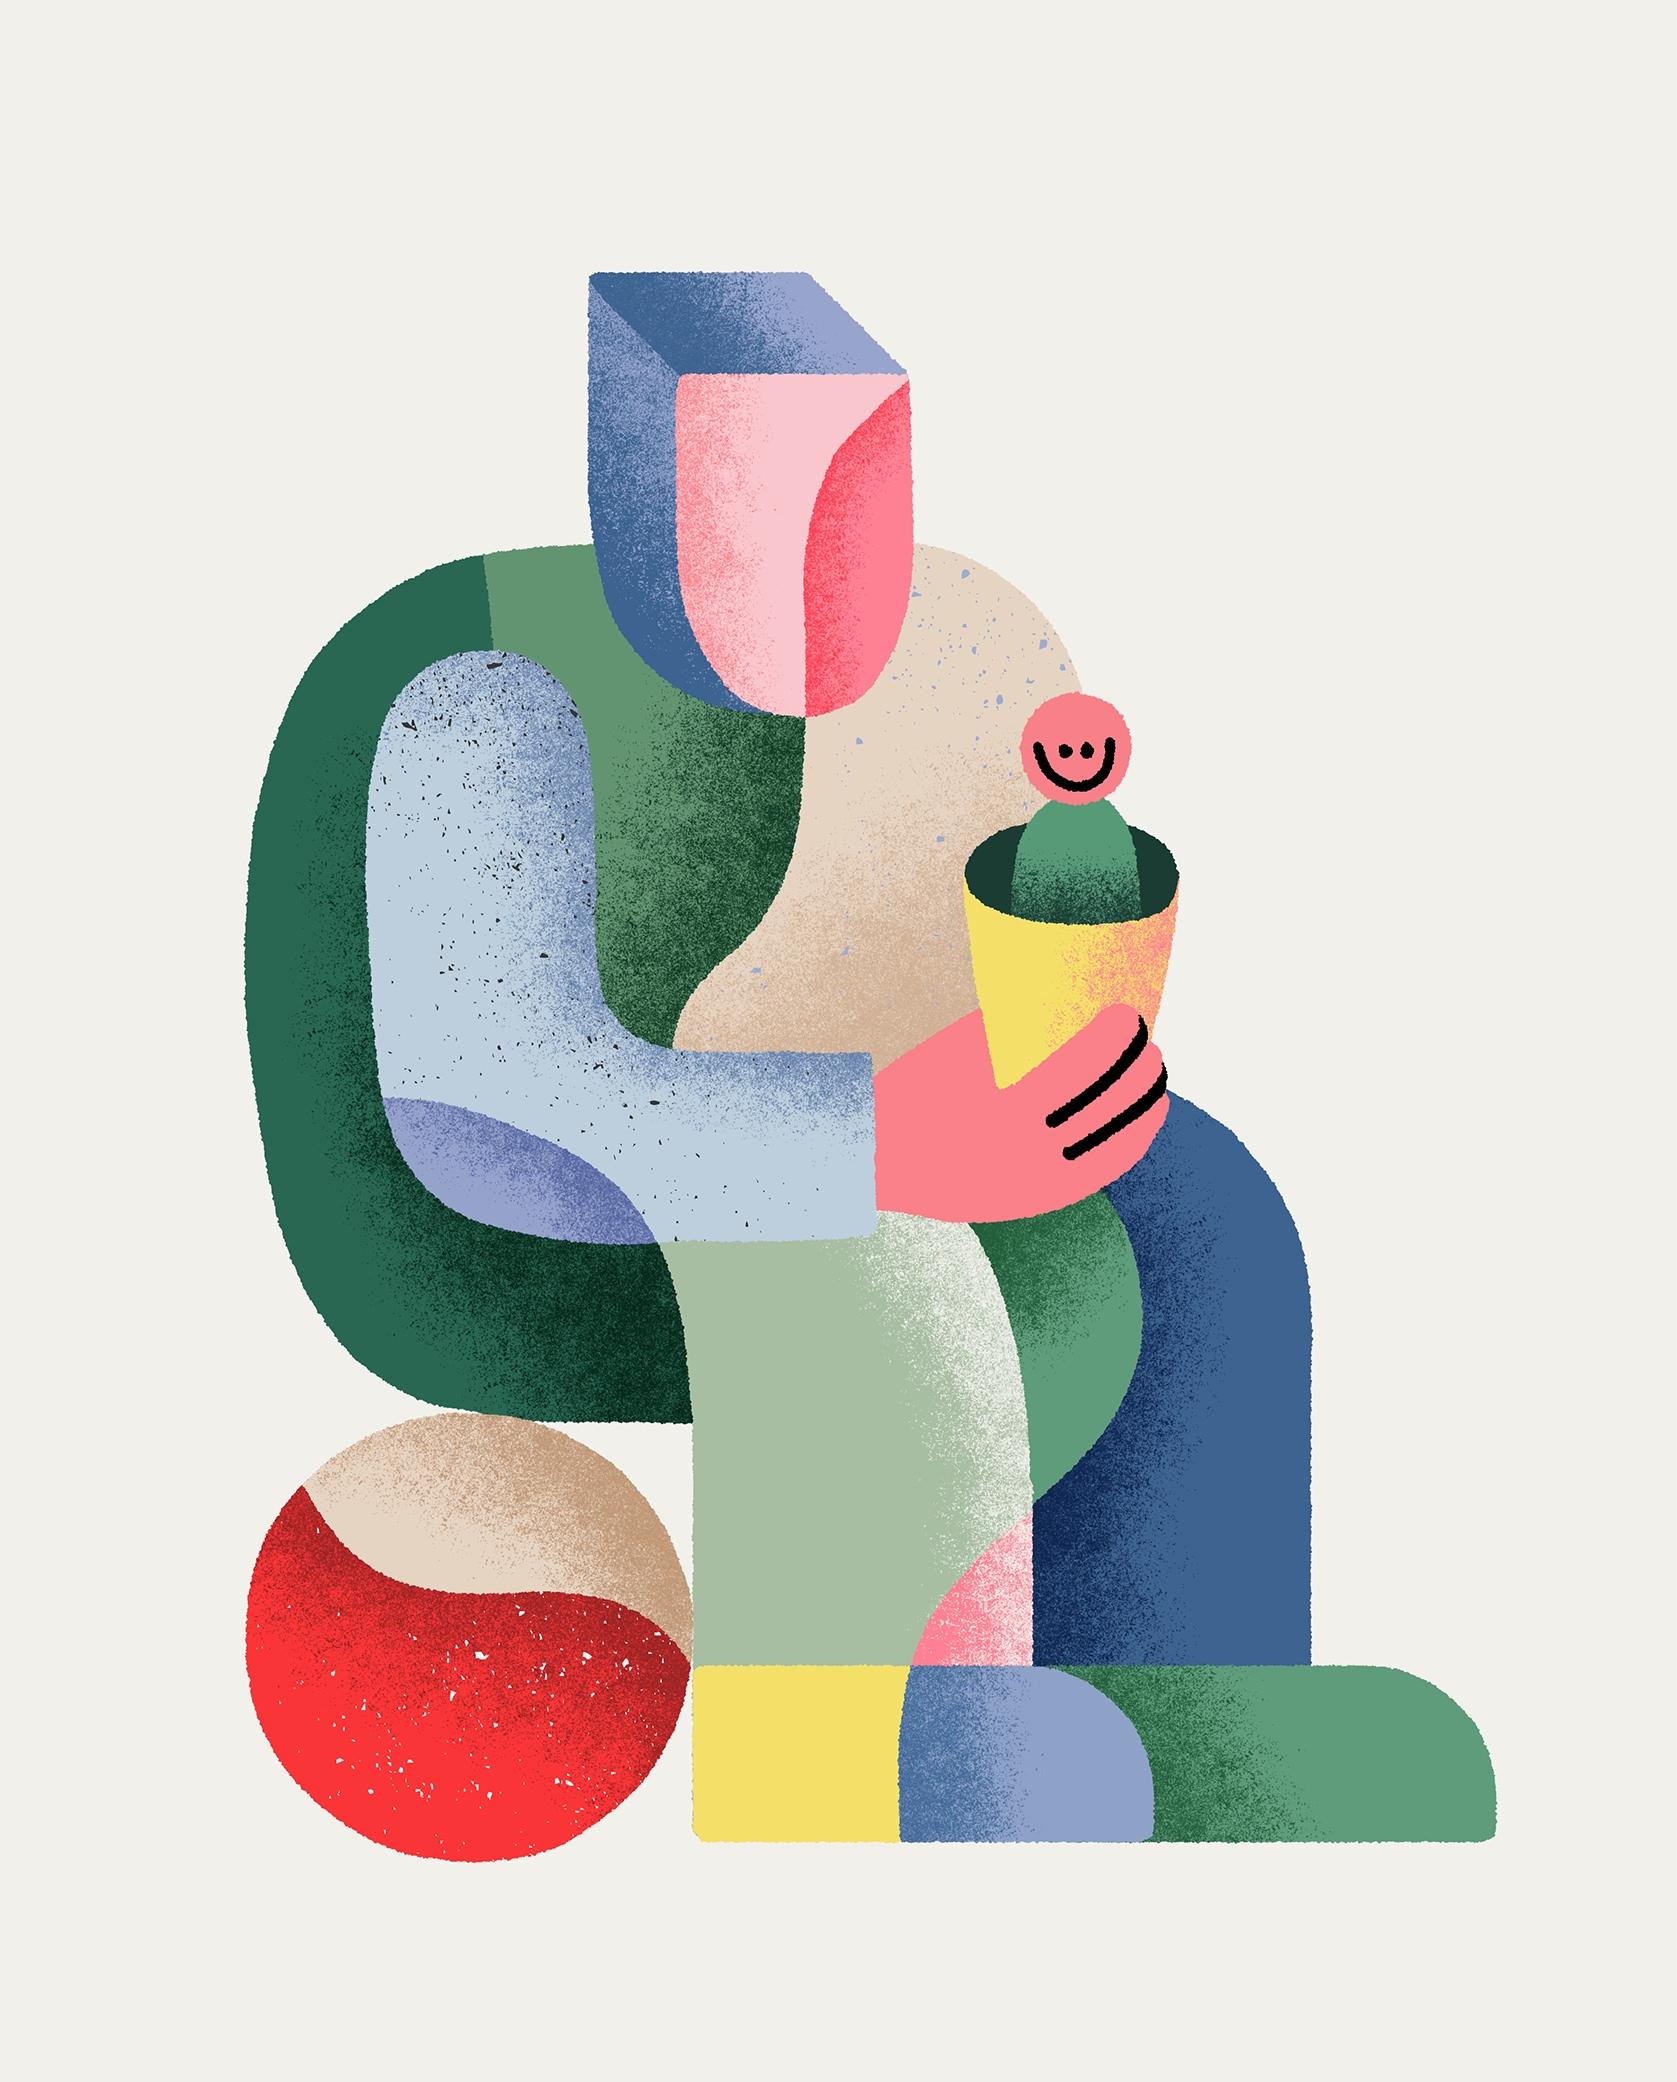 icimathieu-illustrateur-mathieu-clauss-smile